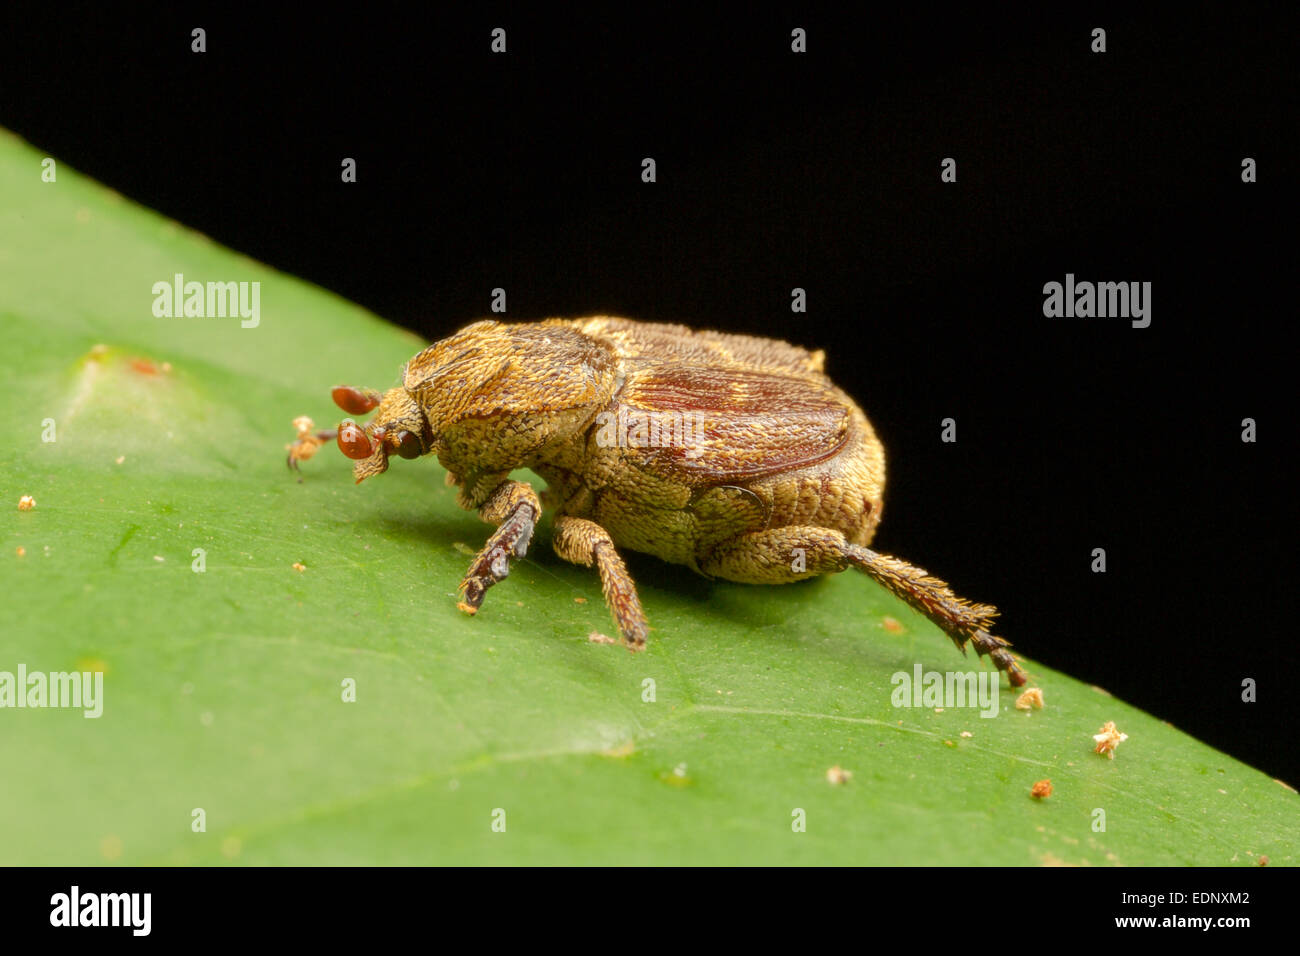 The rose beetle, Adoretus compressus. - Stock Image